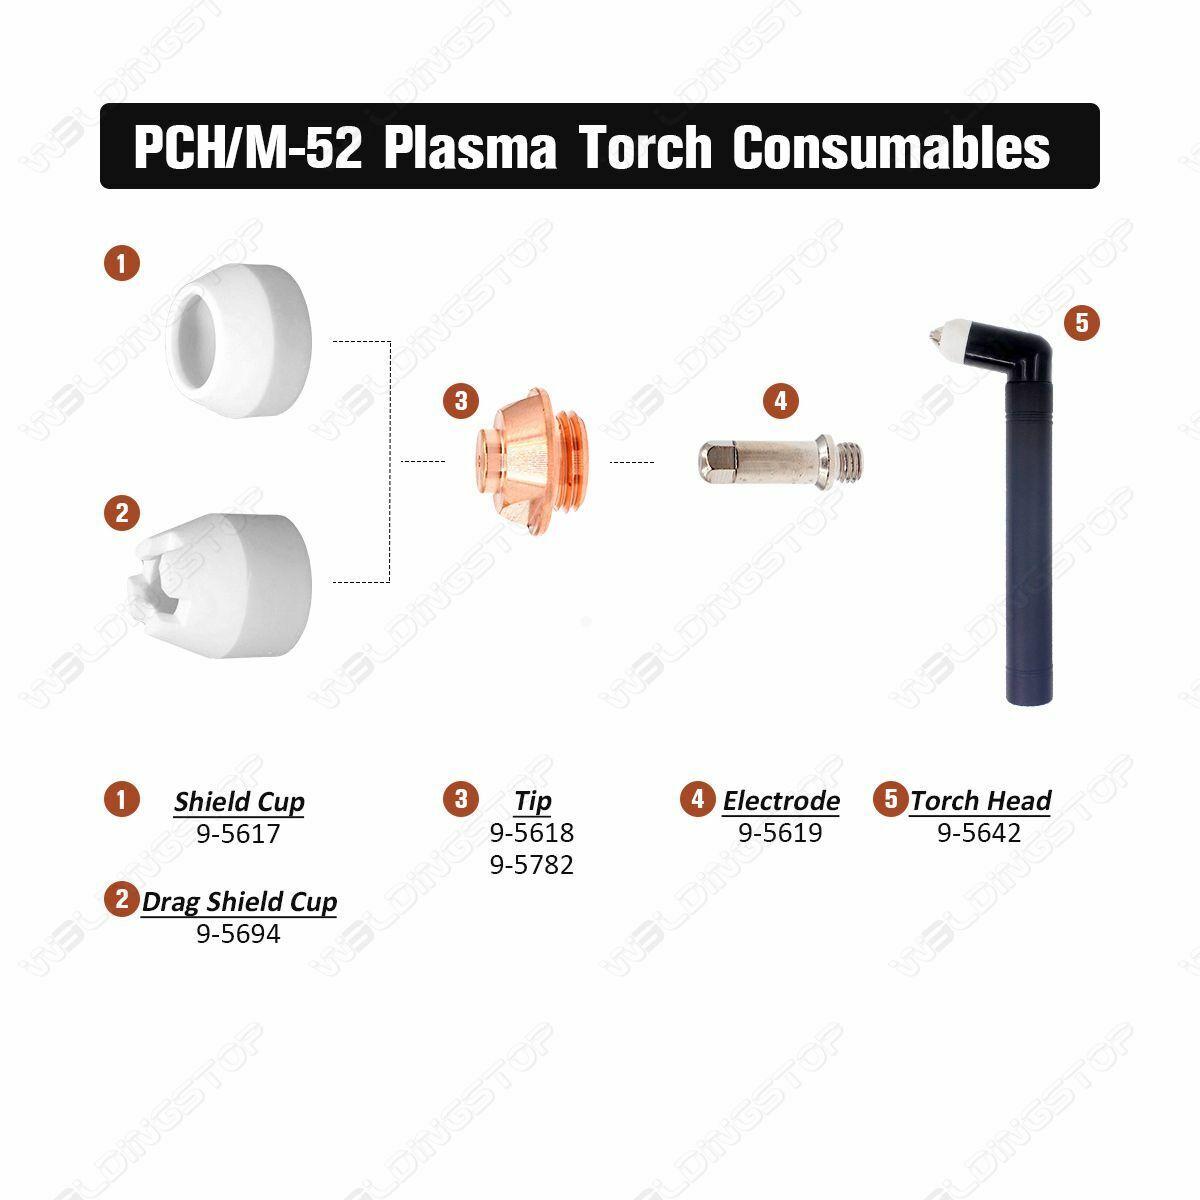 9-5619 Plasma Electrode 9-5618 Tip 50A 9-5617 fit PCH-52 PCH-53 PAK5XR Pkg-22